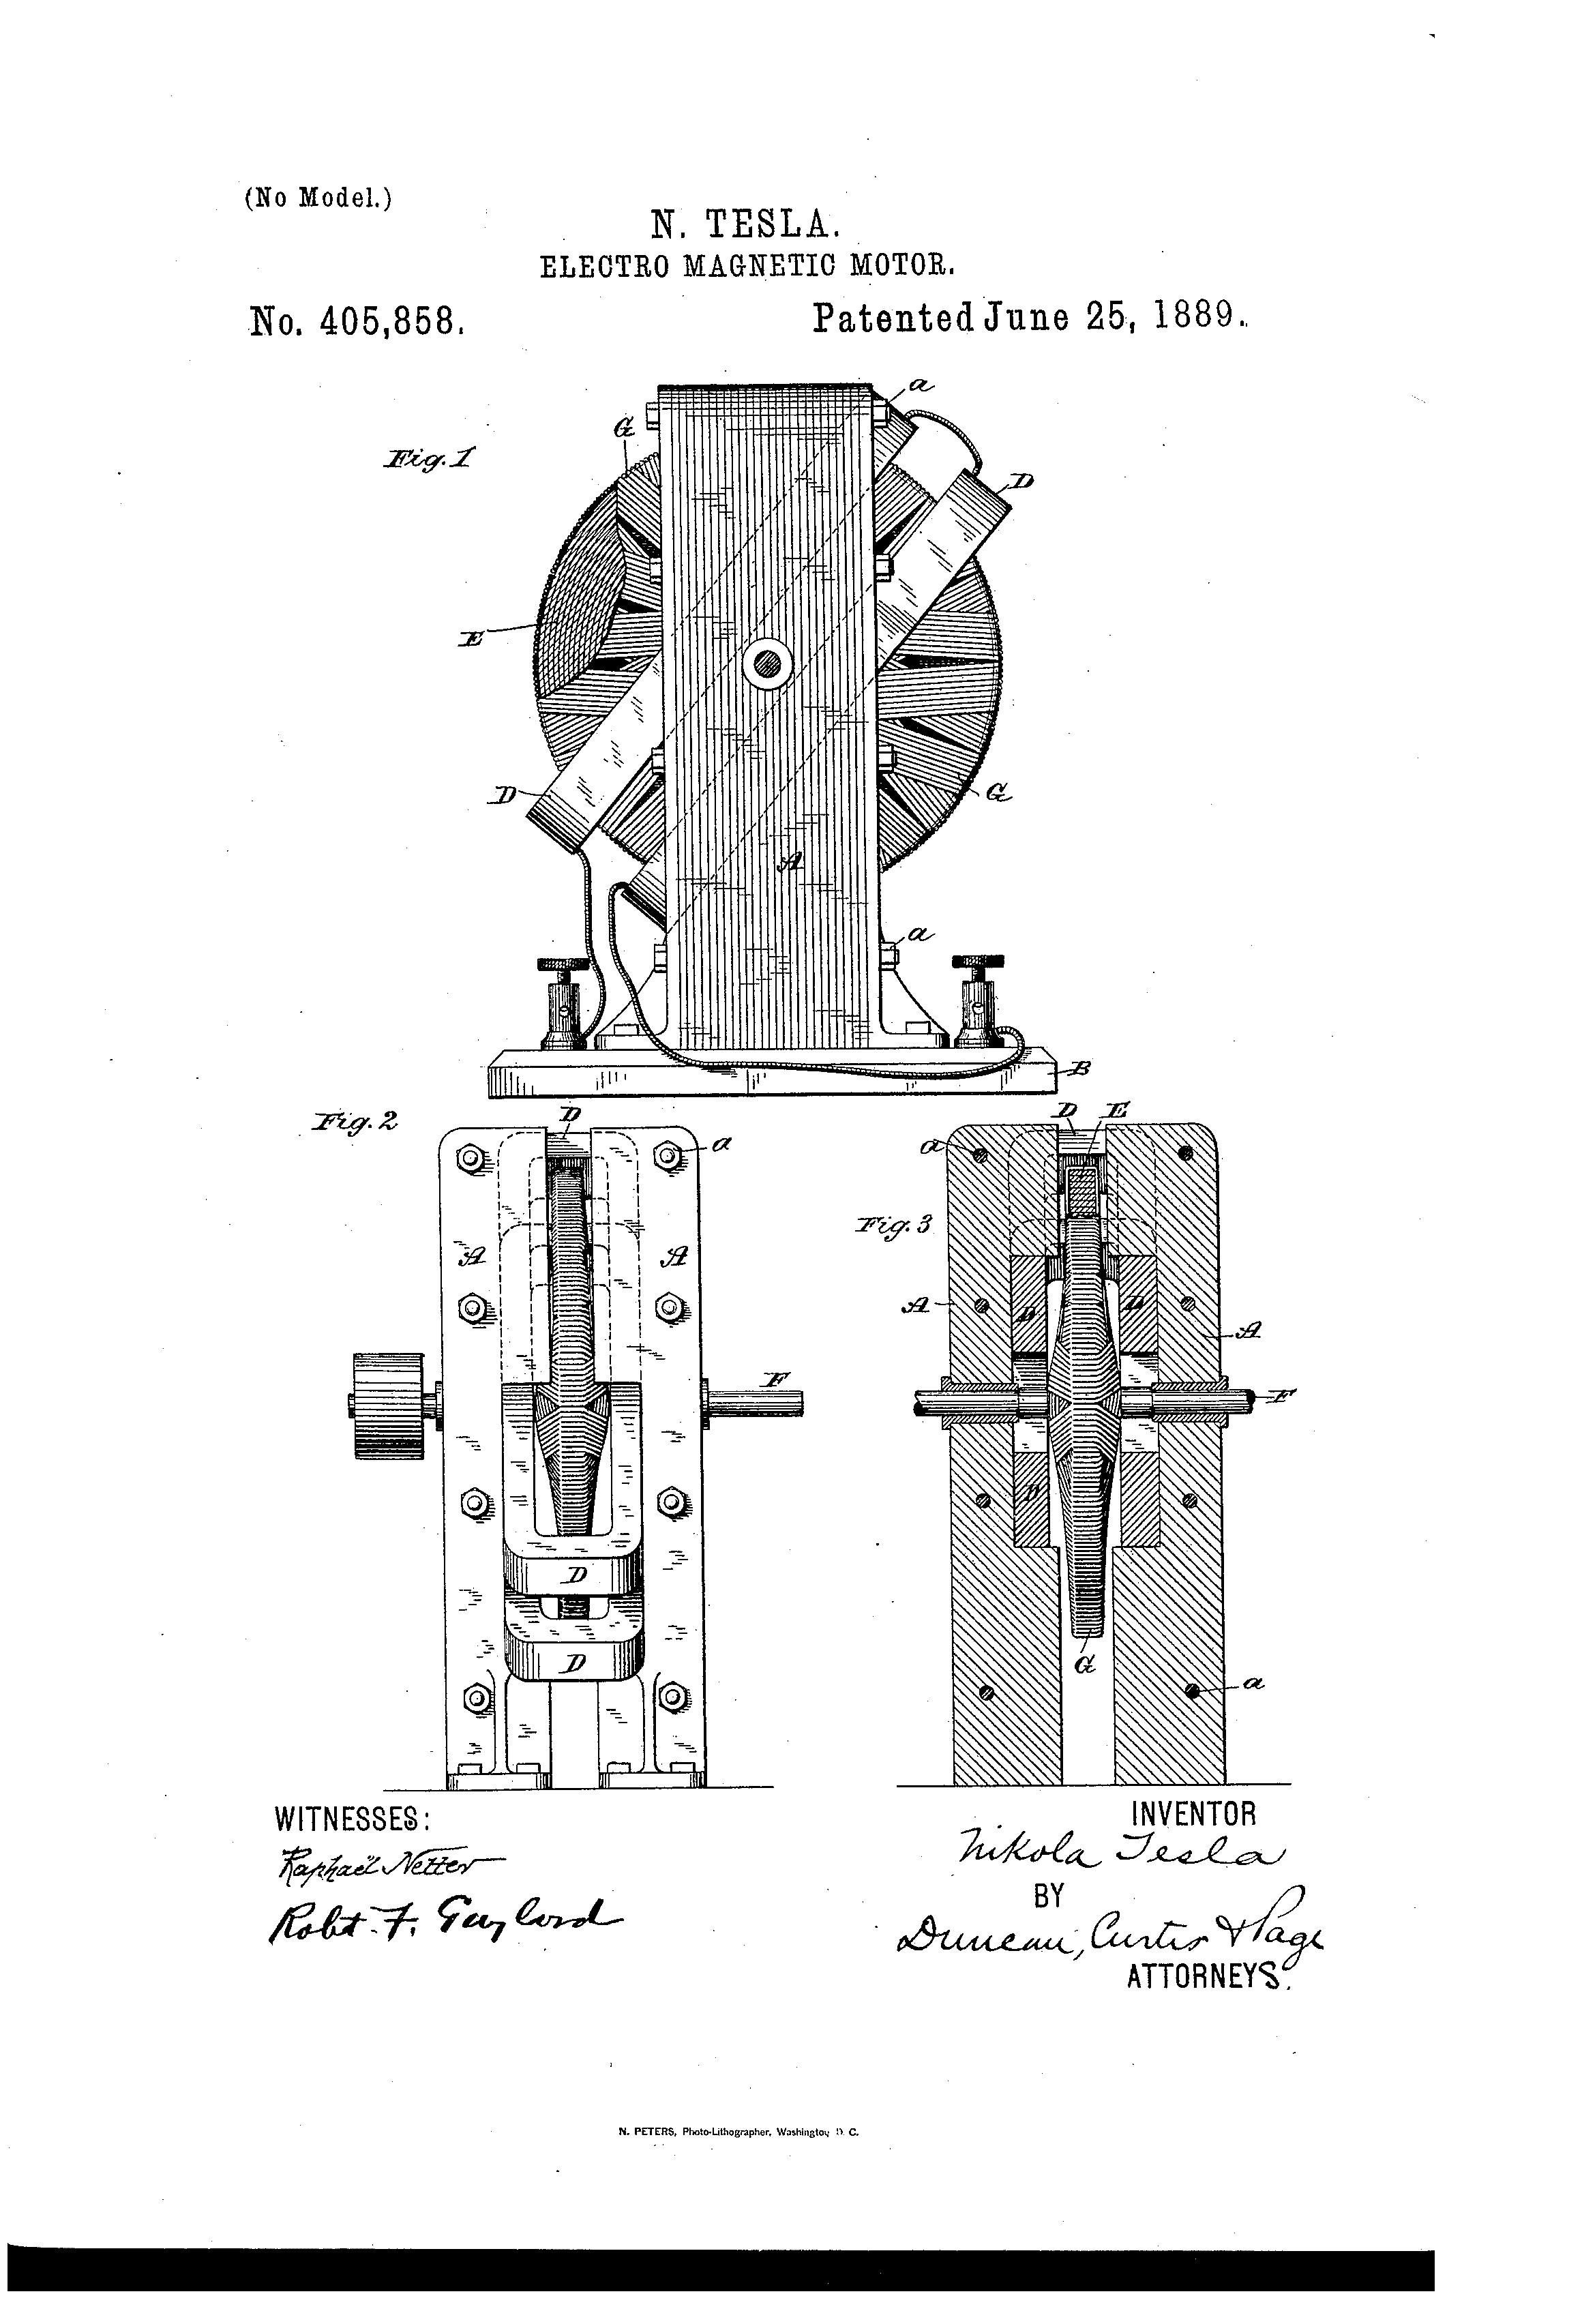 nikola tesla - electro magnetic motor